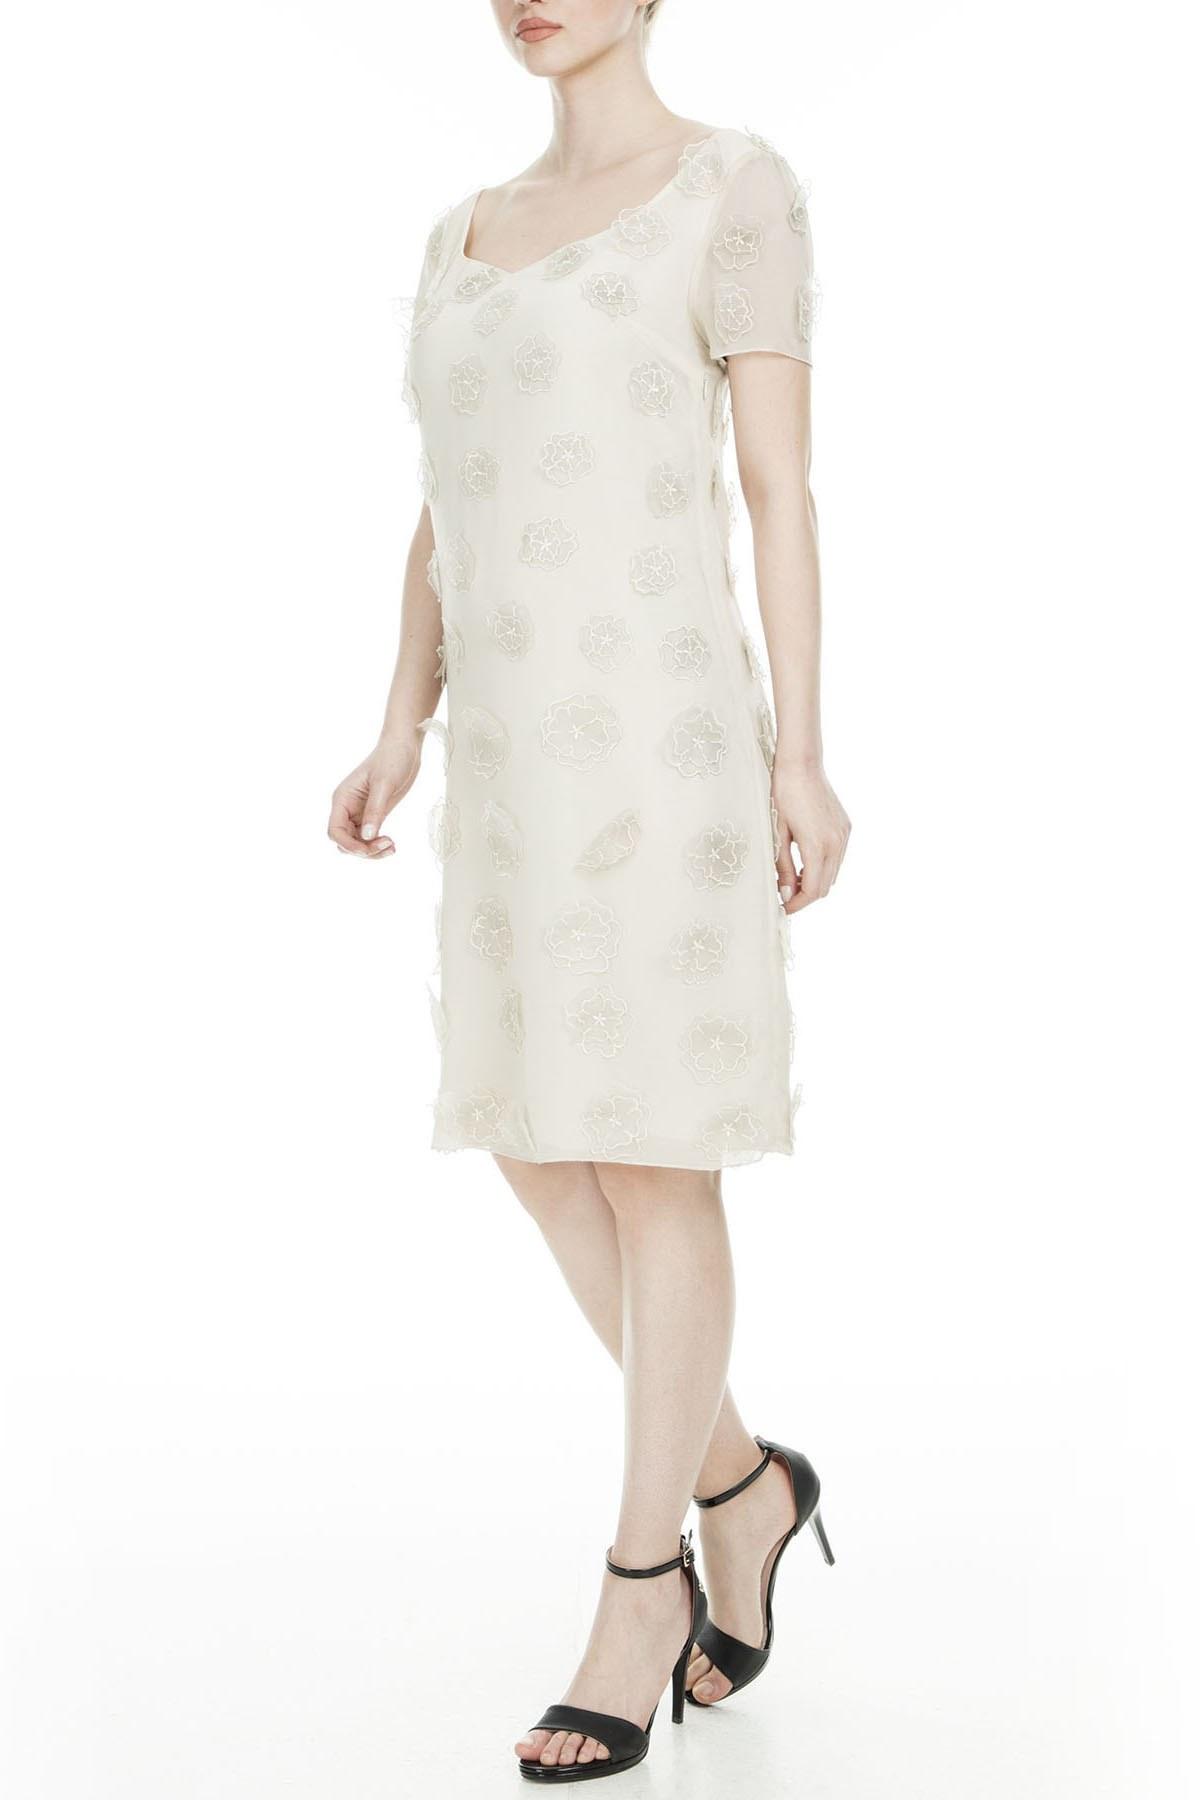 PAOLA FRANI Kadın Elbise 224002C138